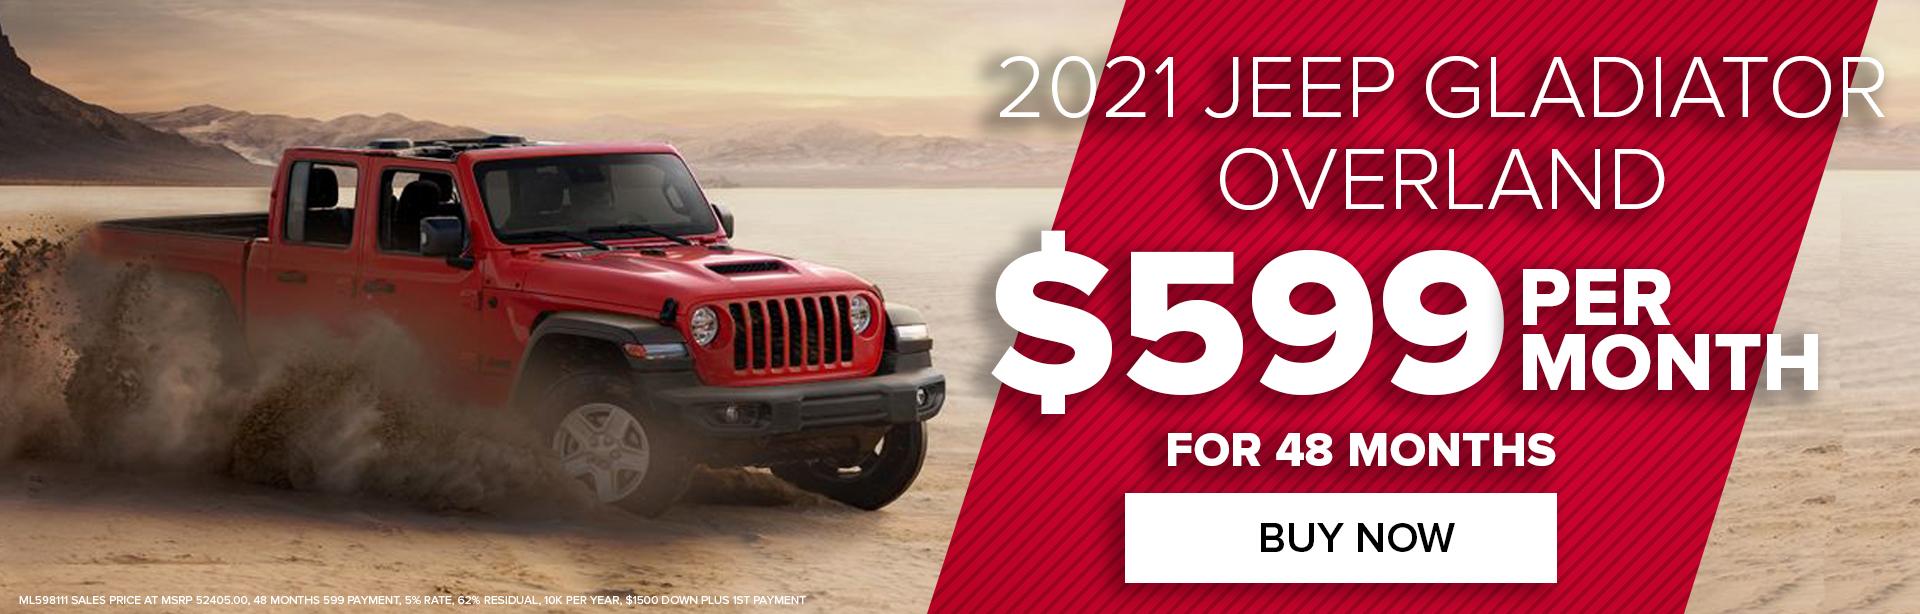 Get a Jeep Gladiator Overland For $599 Per Month For 48 Months Payne Edinburg CDJR  Edinburg, TX